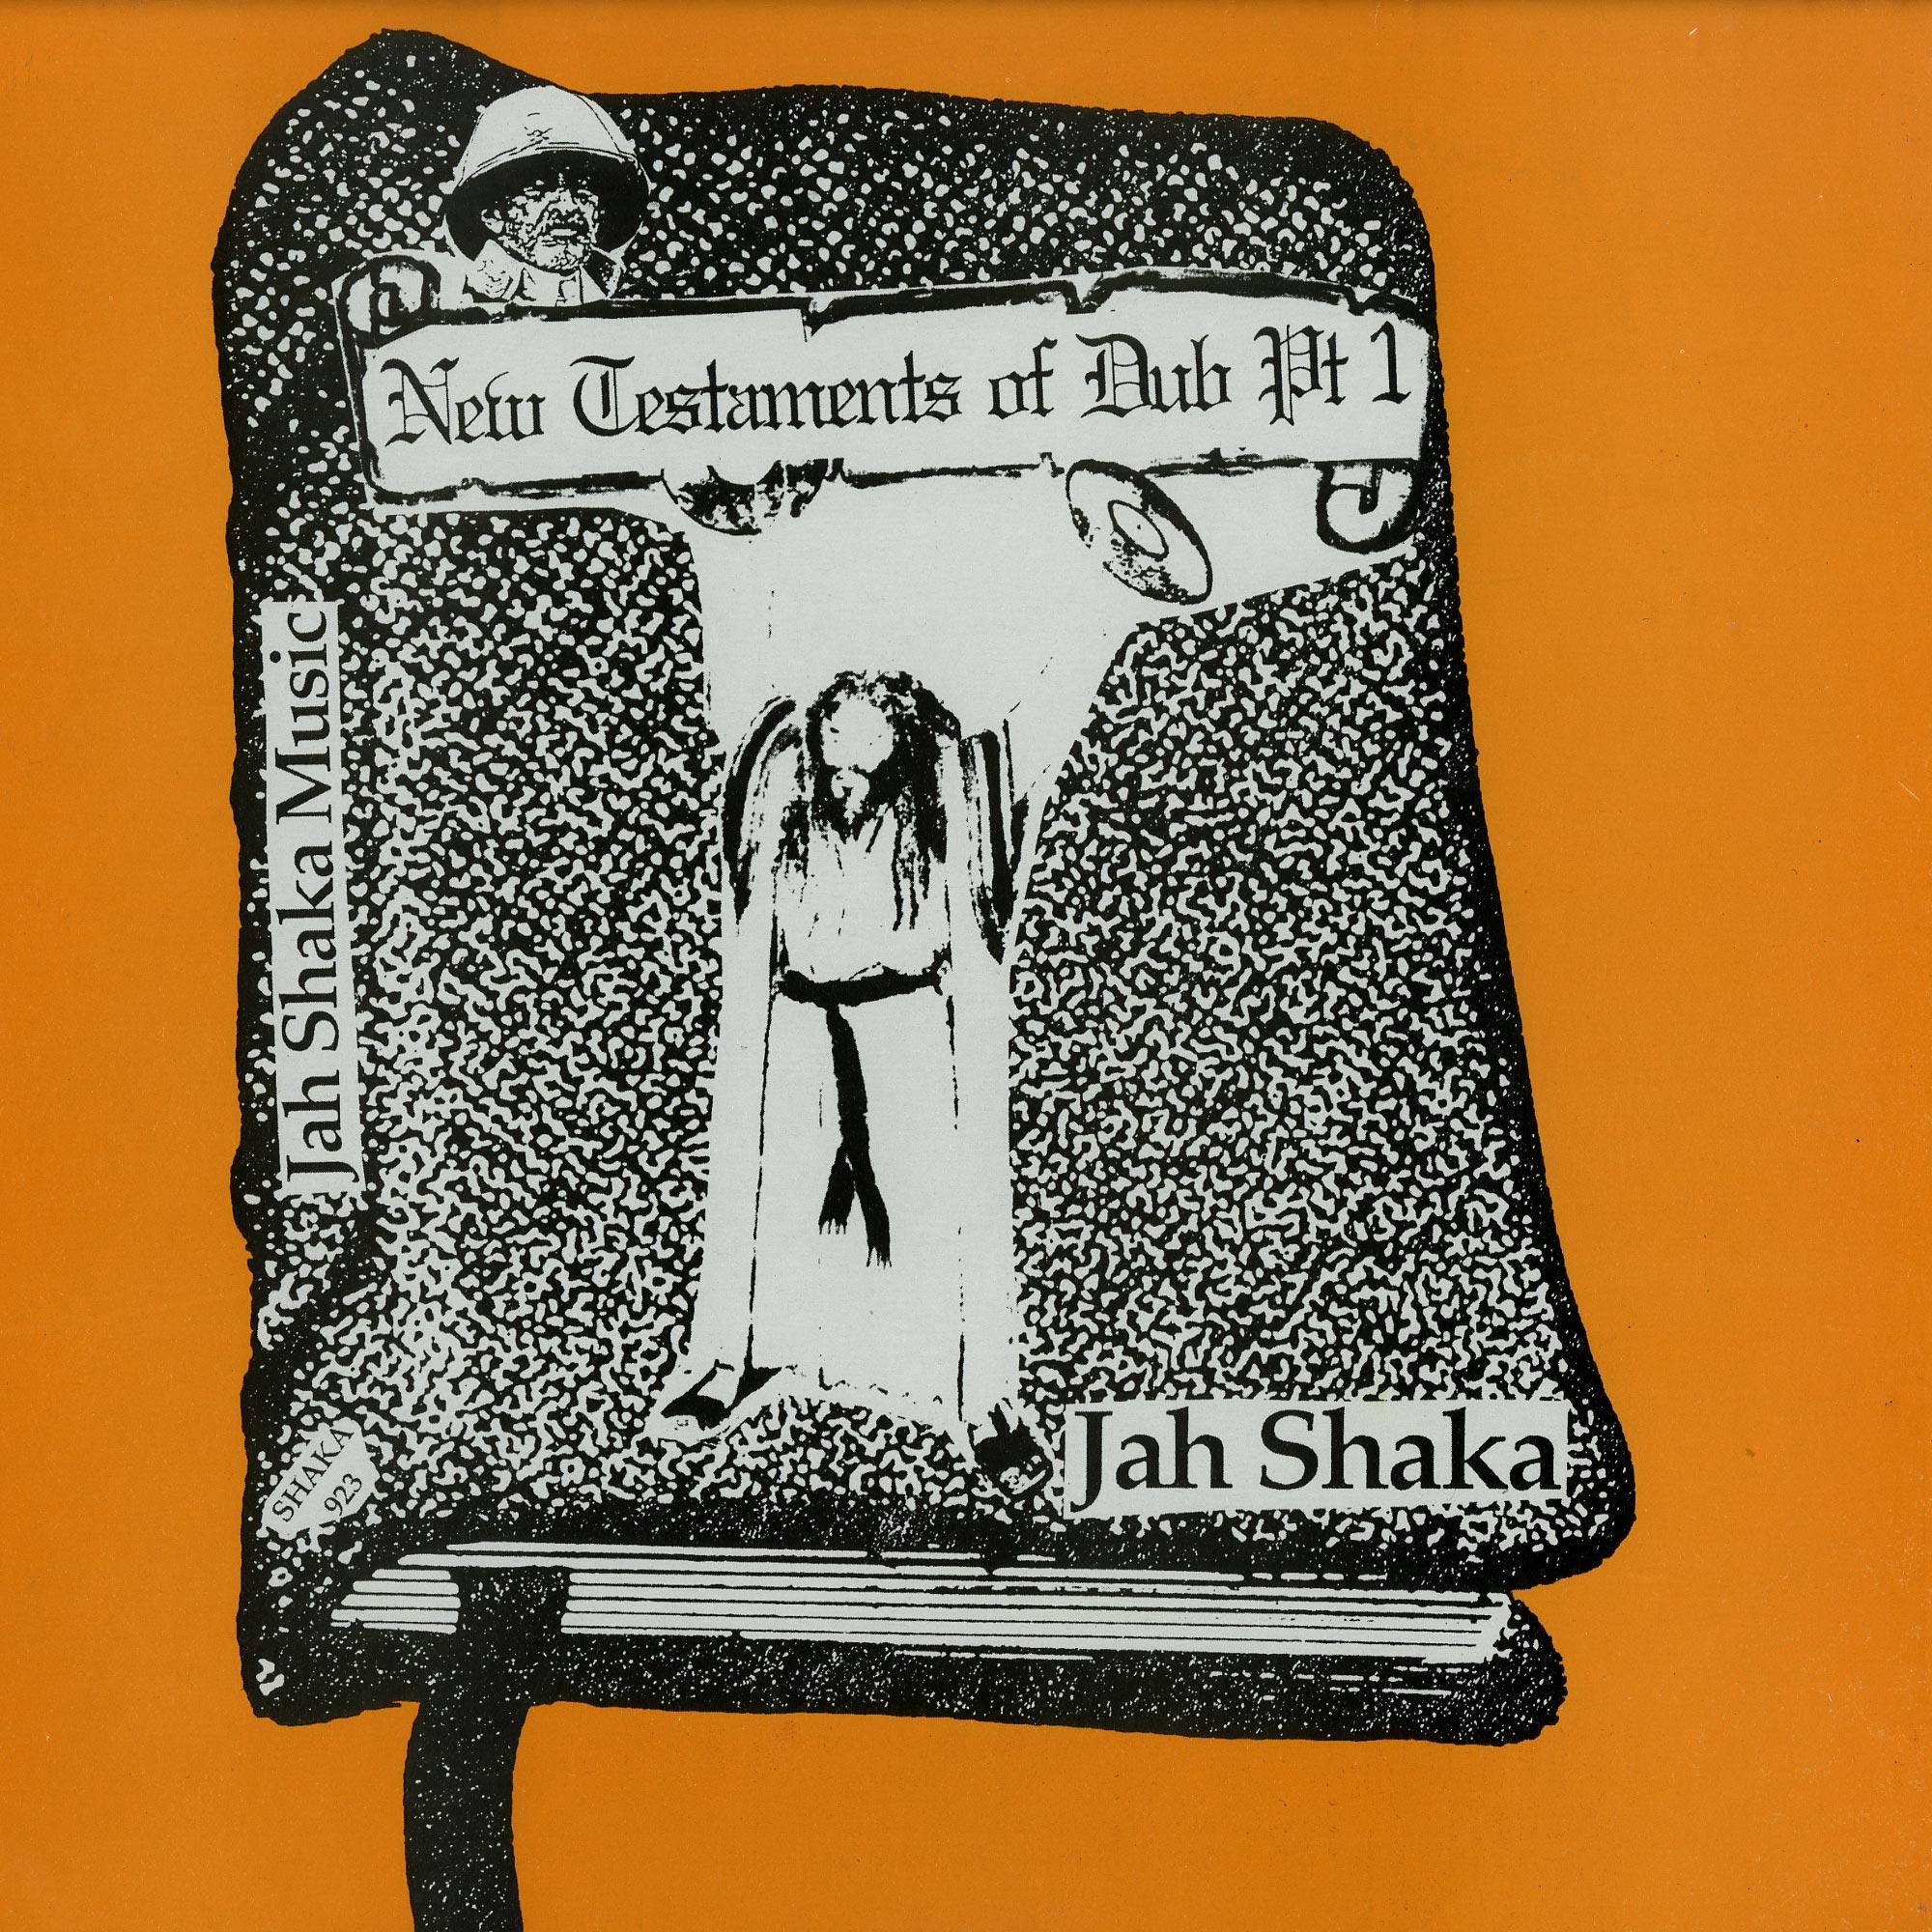 Jah Shaka - NEW TESTAMENTS OF DUB PART 1